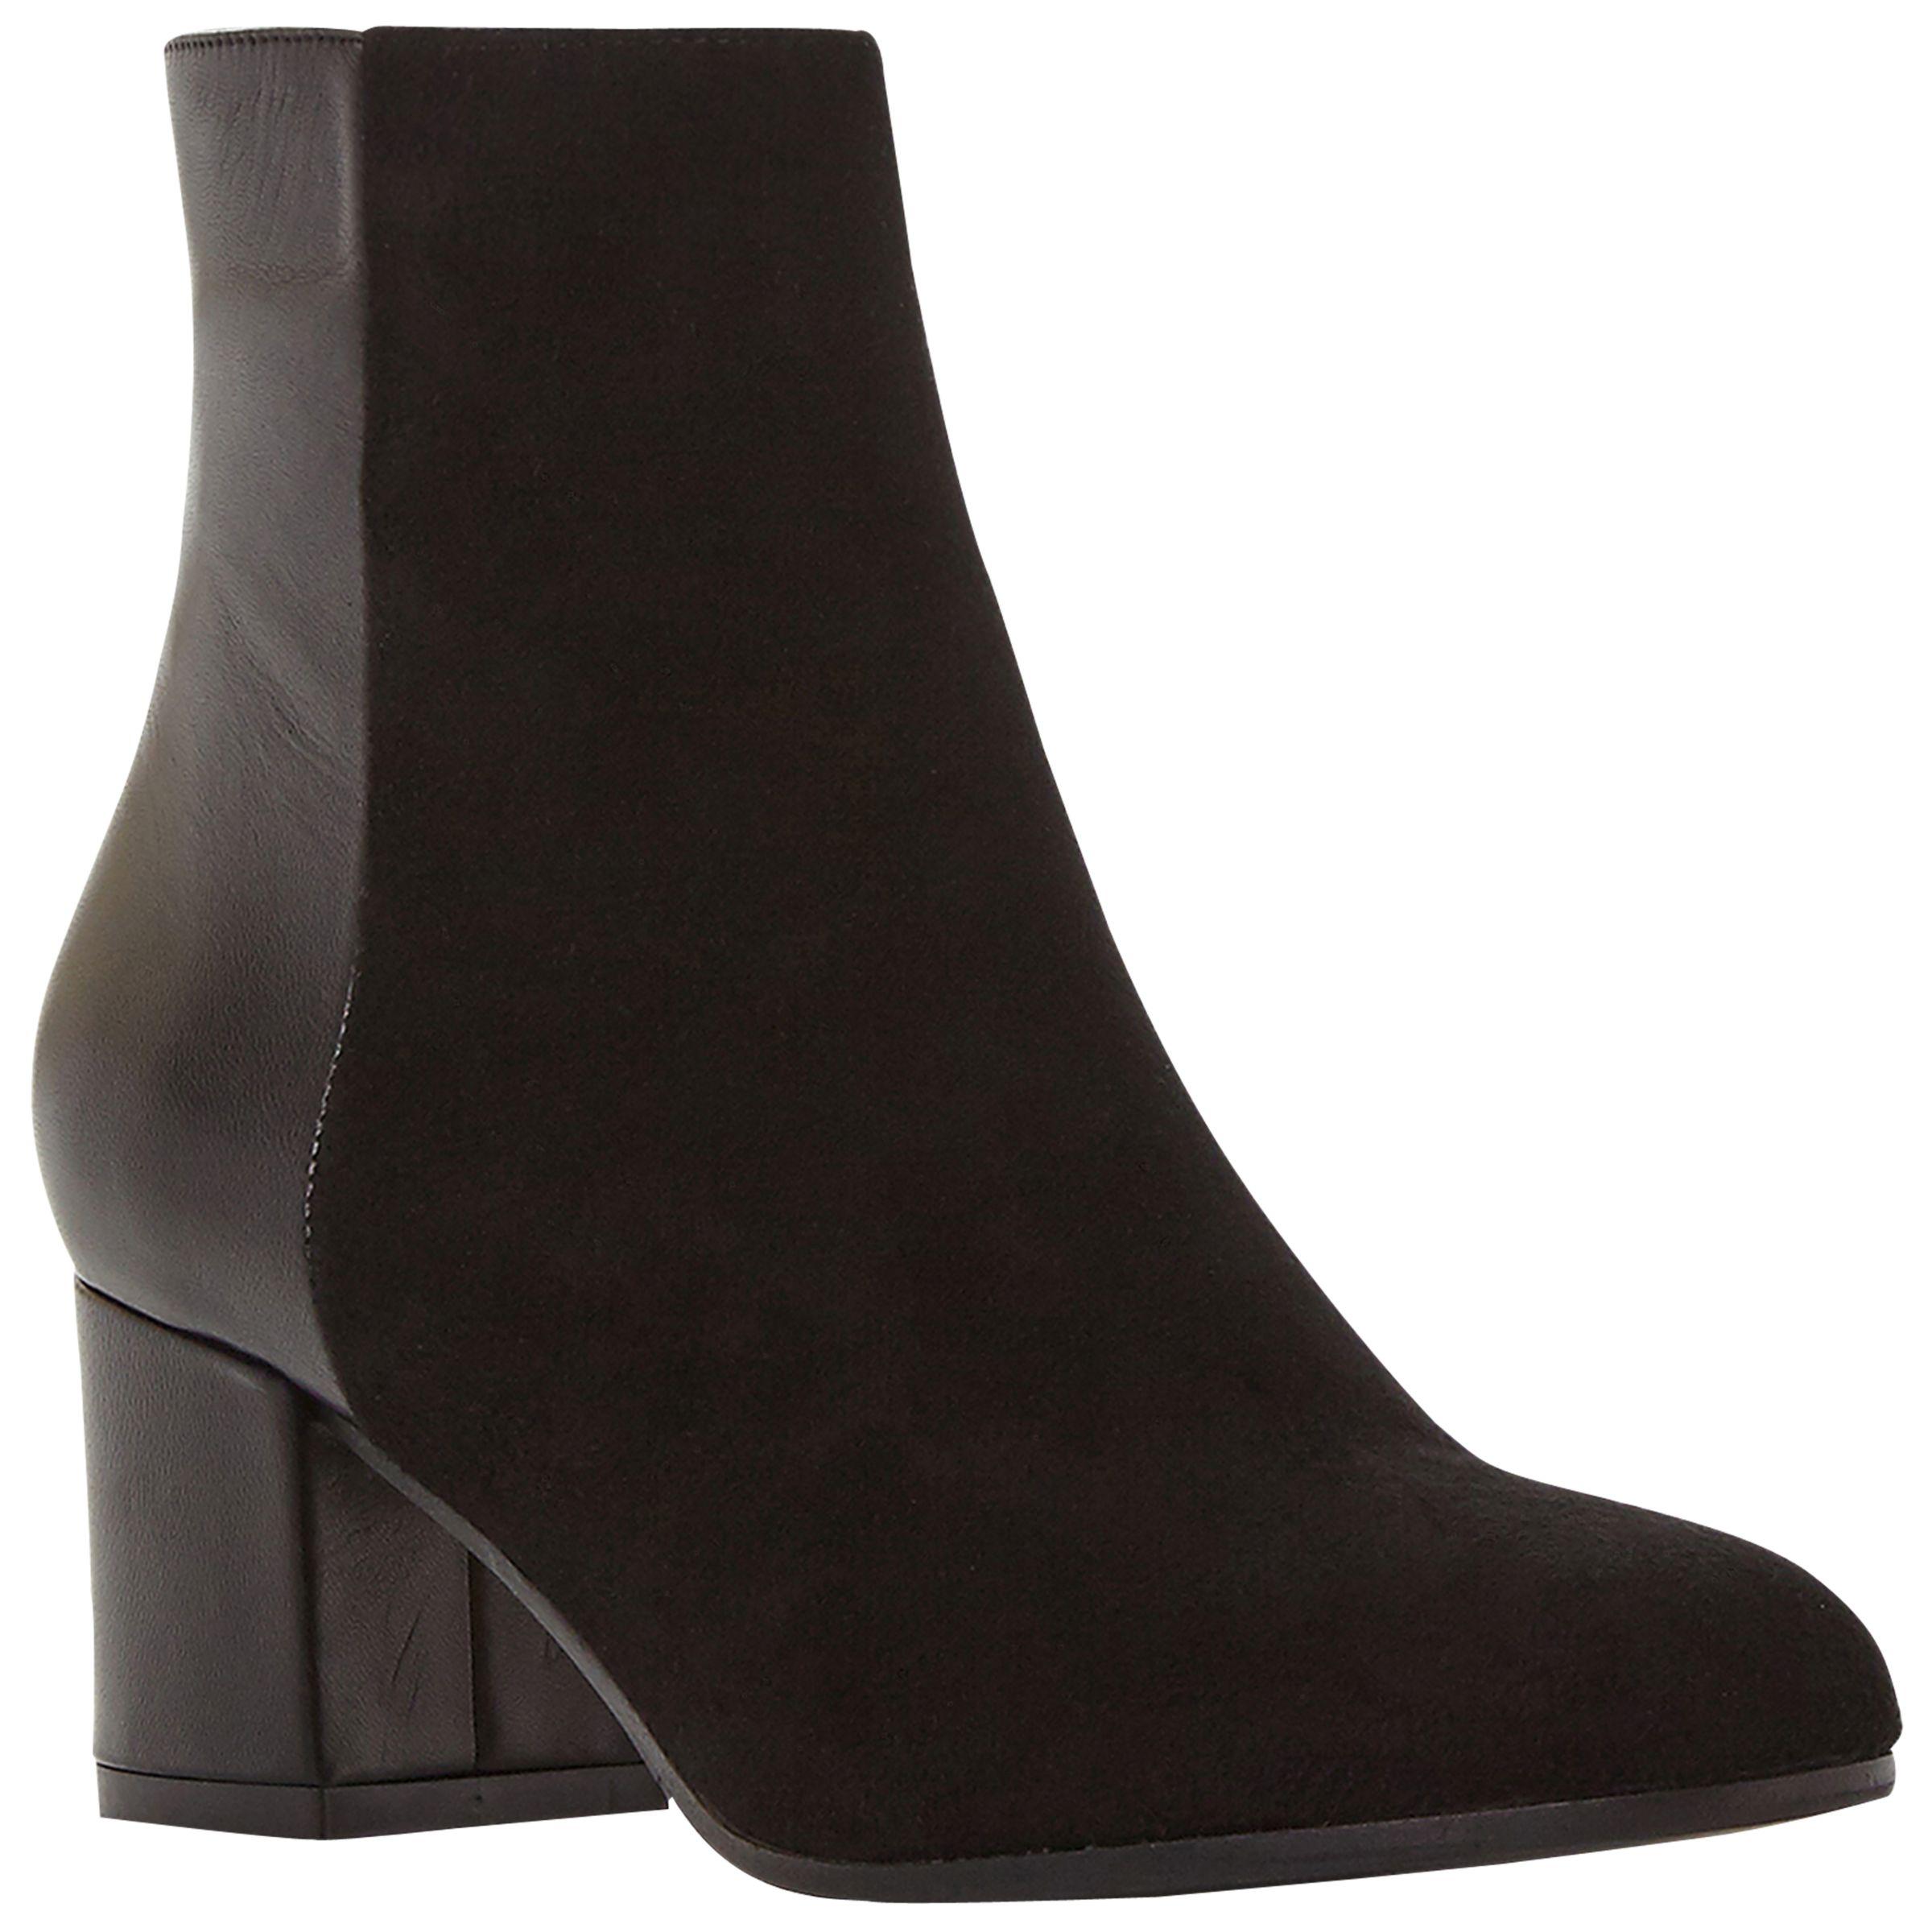 Dune Black Dune Black Orsen Classic Block Heeled Ankle Boots, Black